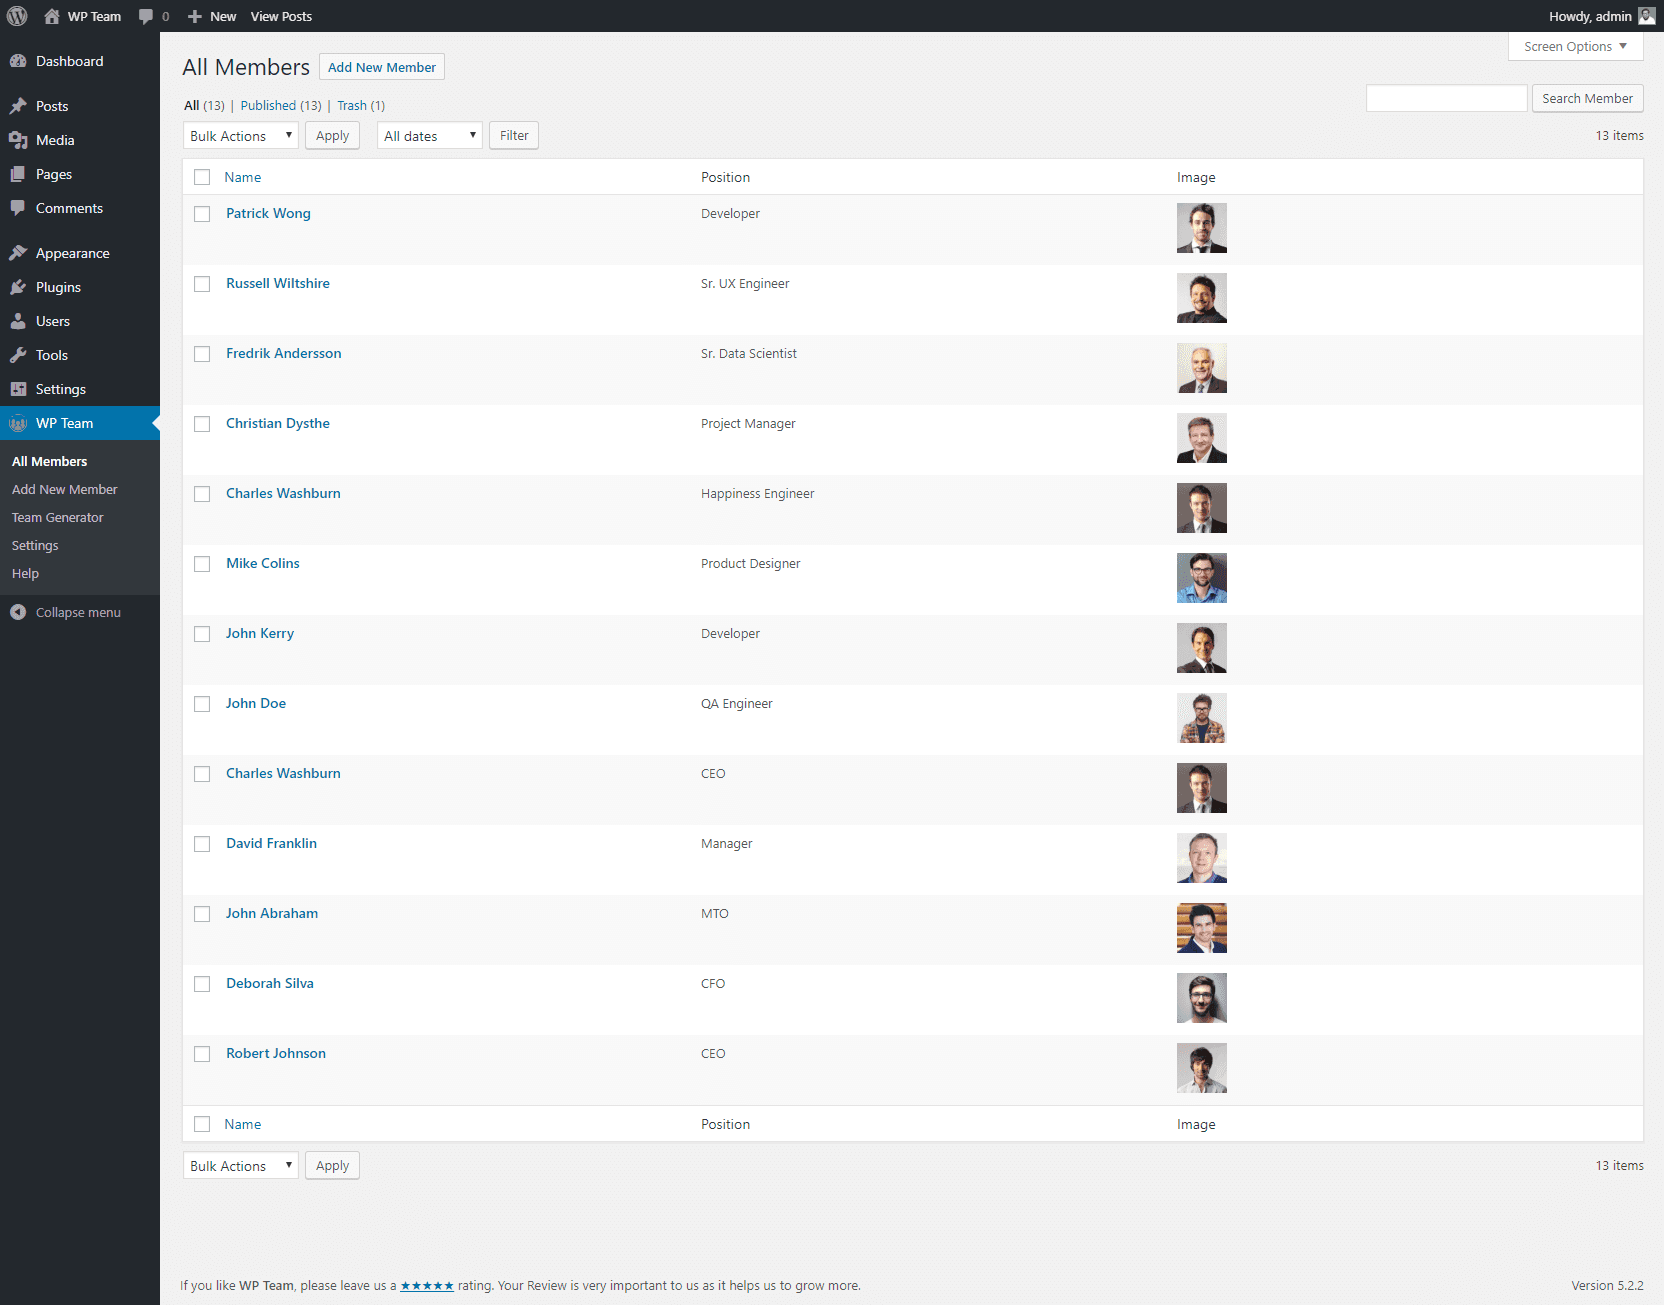 All Team Members